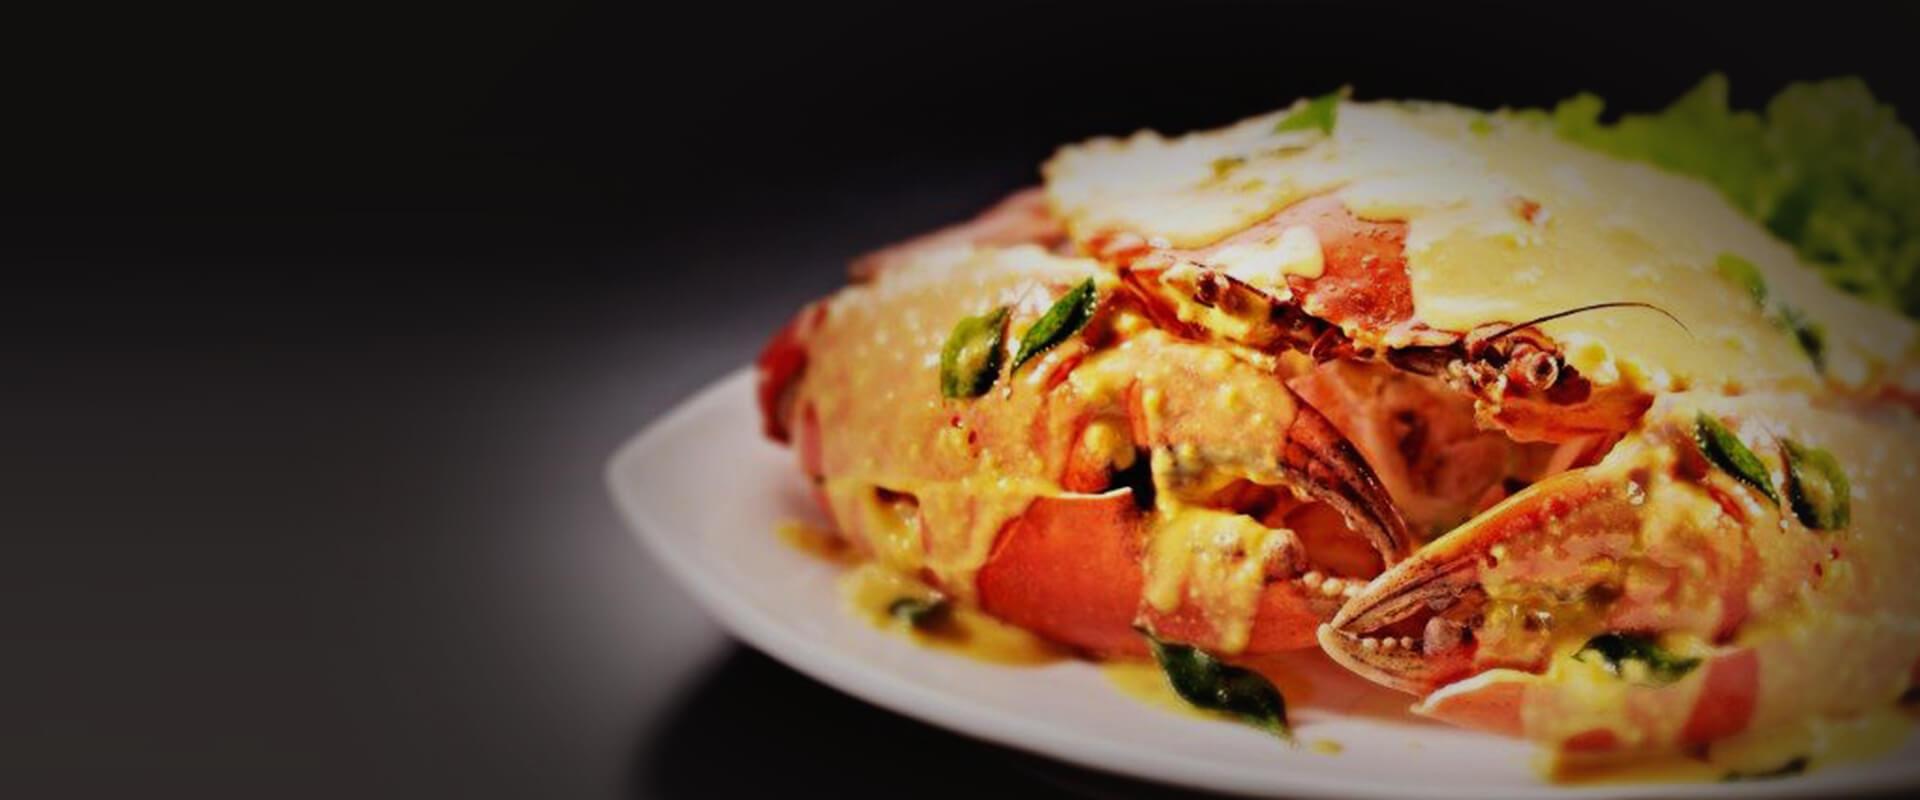 <p>Award-Winning Chilli Crab</p> <p>Voted the Best Pepper Crab</p>